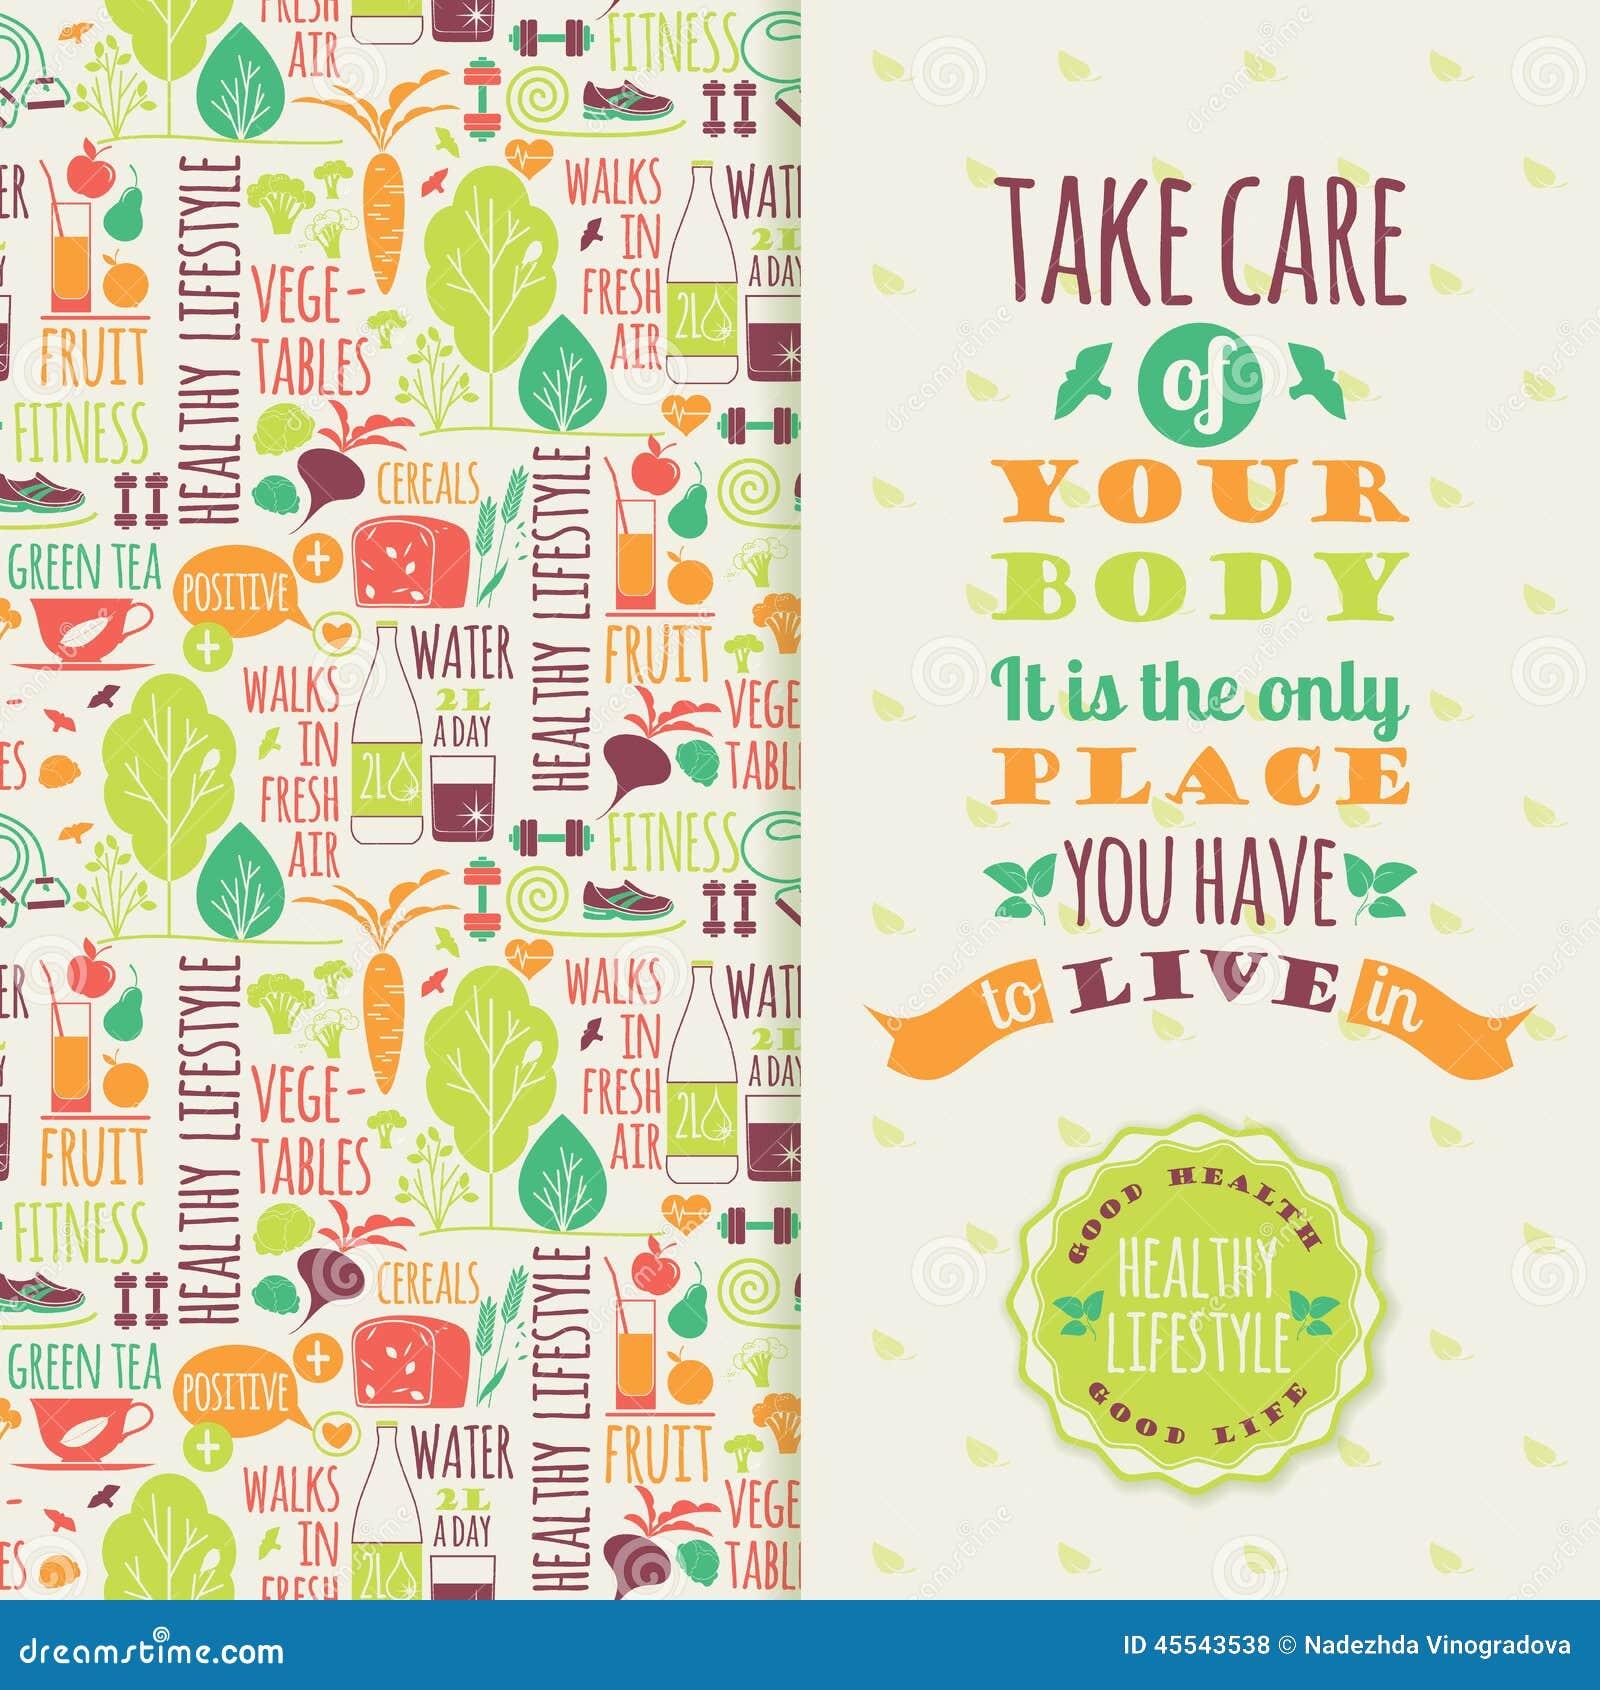 Healthy Lifestyle Vector Illustration 45543538